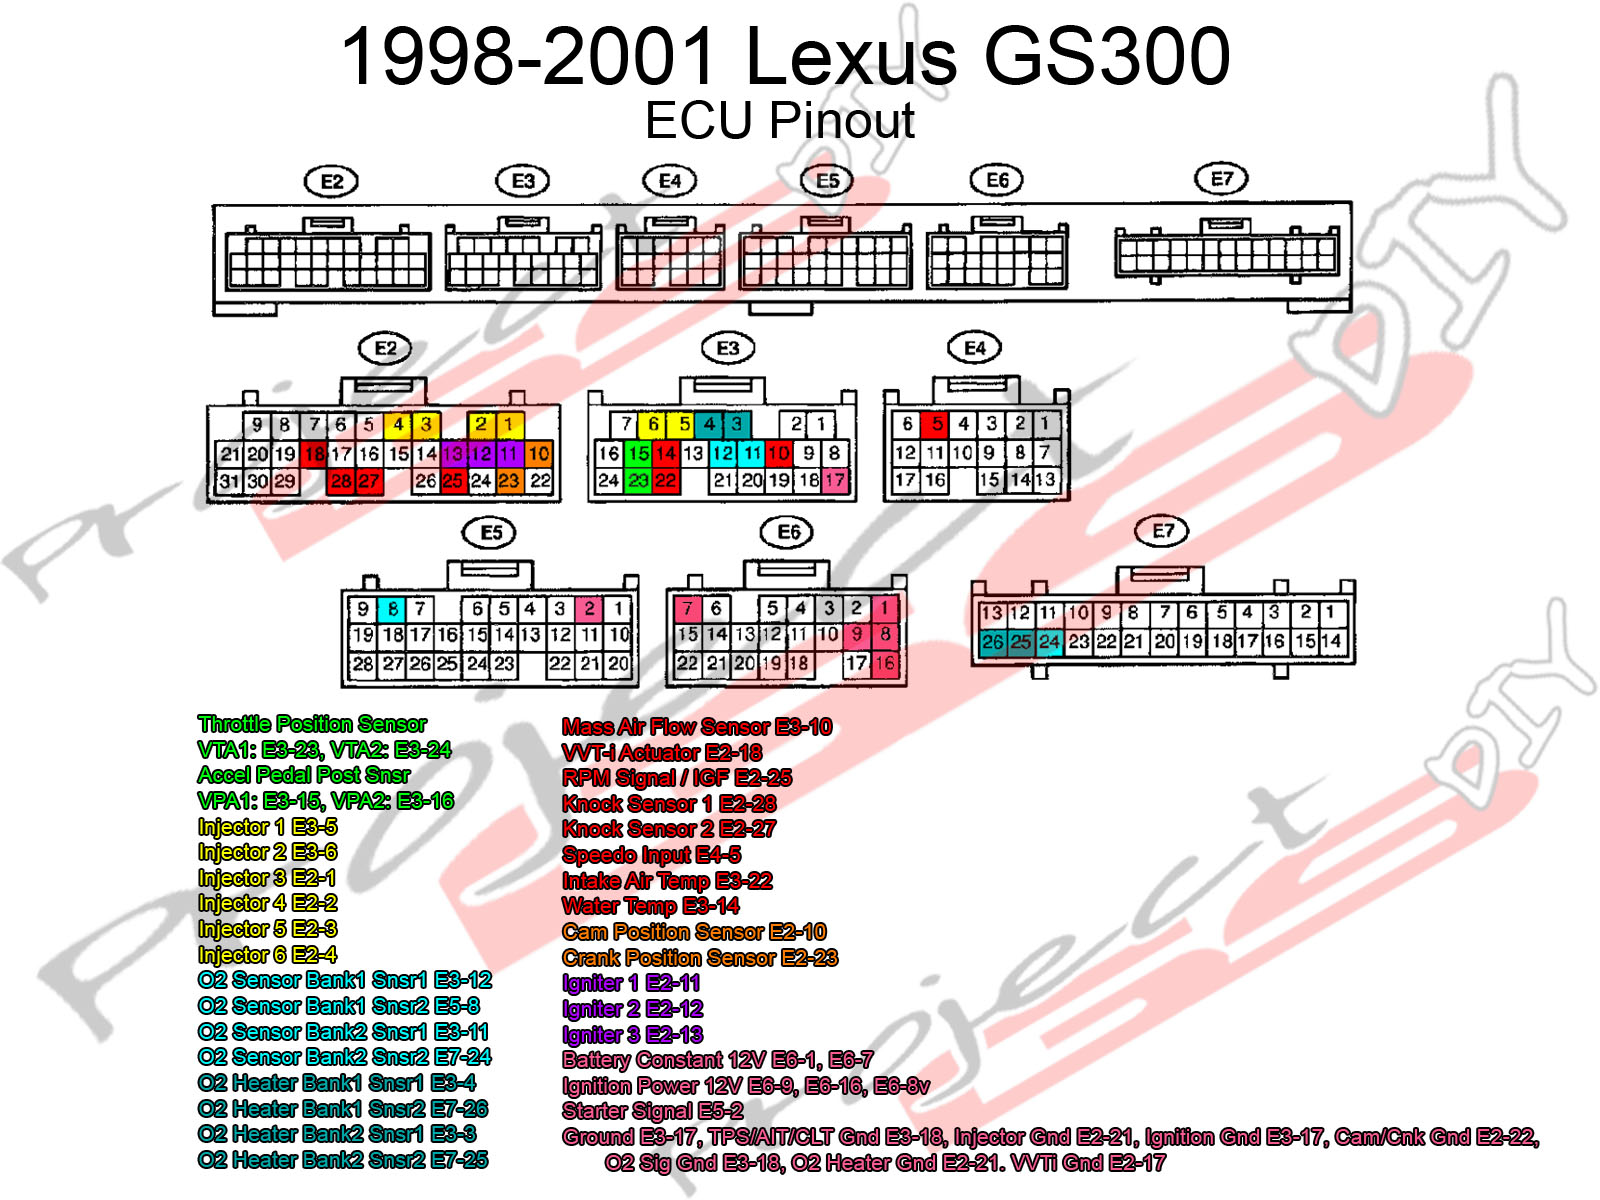 2006 Lexus Gs300 Radio Wiring Diagram - Wiring Diagram Wah Pedal Mods -  pontiacs.tukune.jeanjaures37.fr | Gs300 Radio Wiring Diagram |  | Wiring Diagram Resource